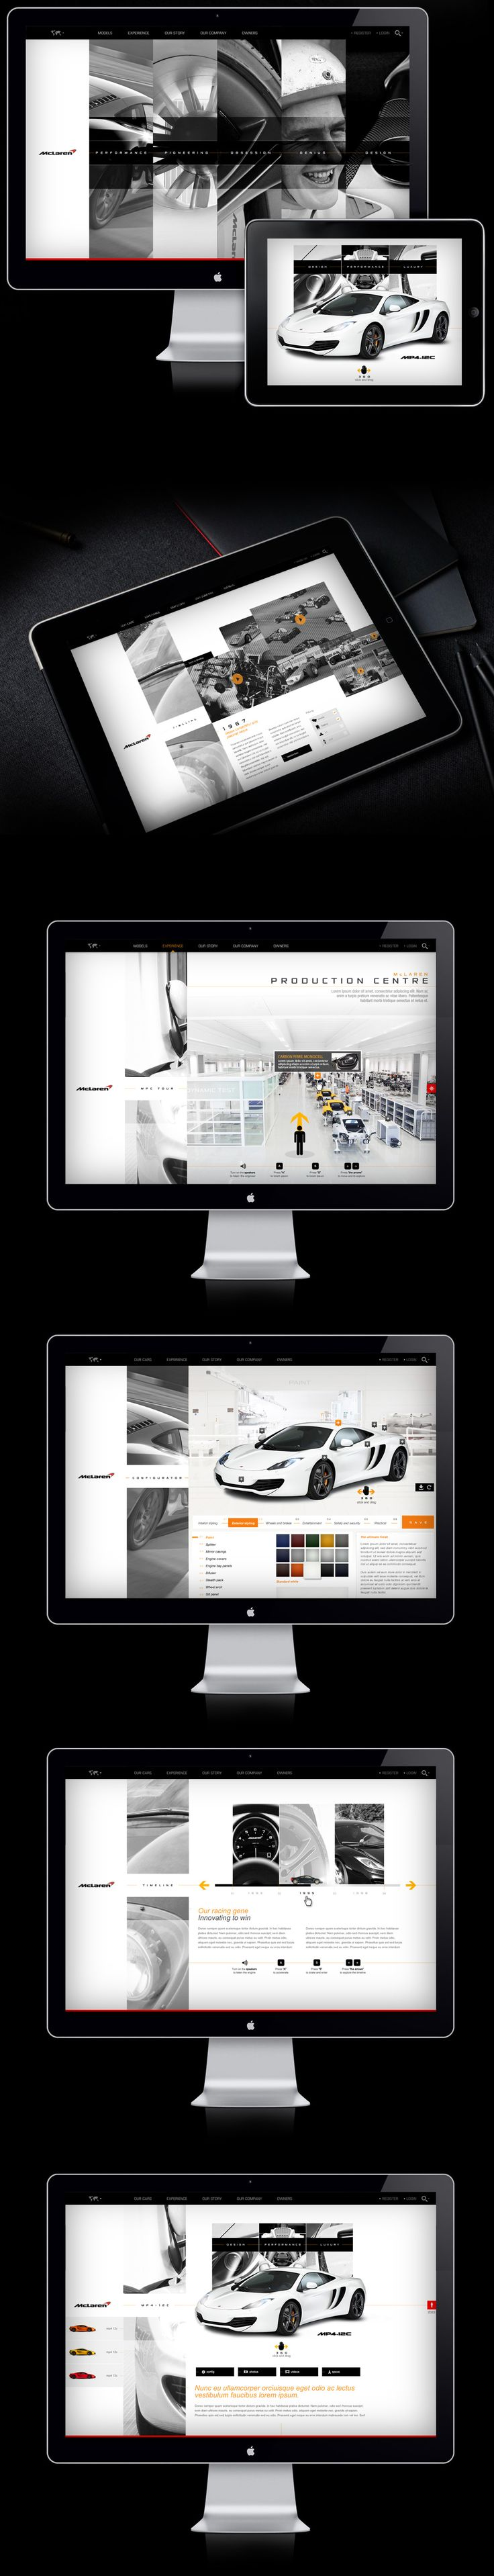 Thomas Moeller, Creative Director : Experience Designer : London